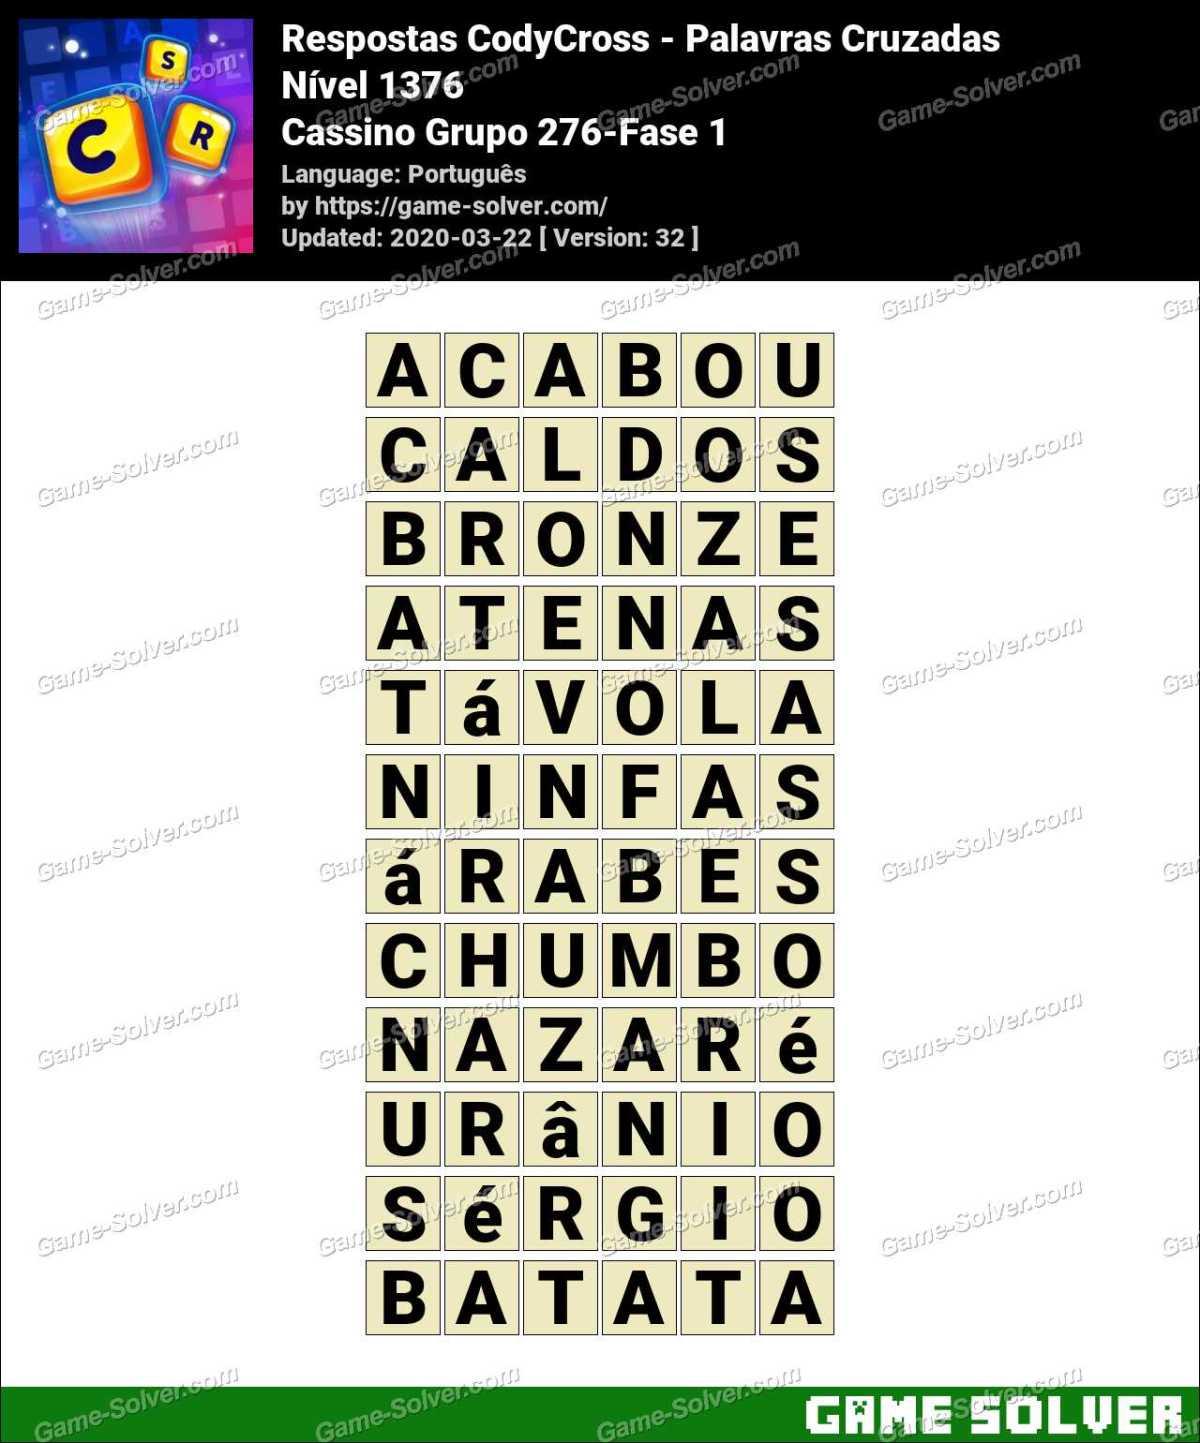 Respostas CodyCross Cassino Grupo 276-Fase 1